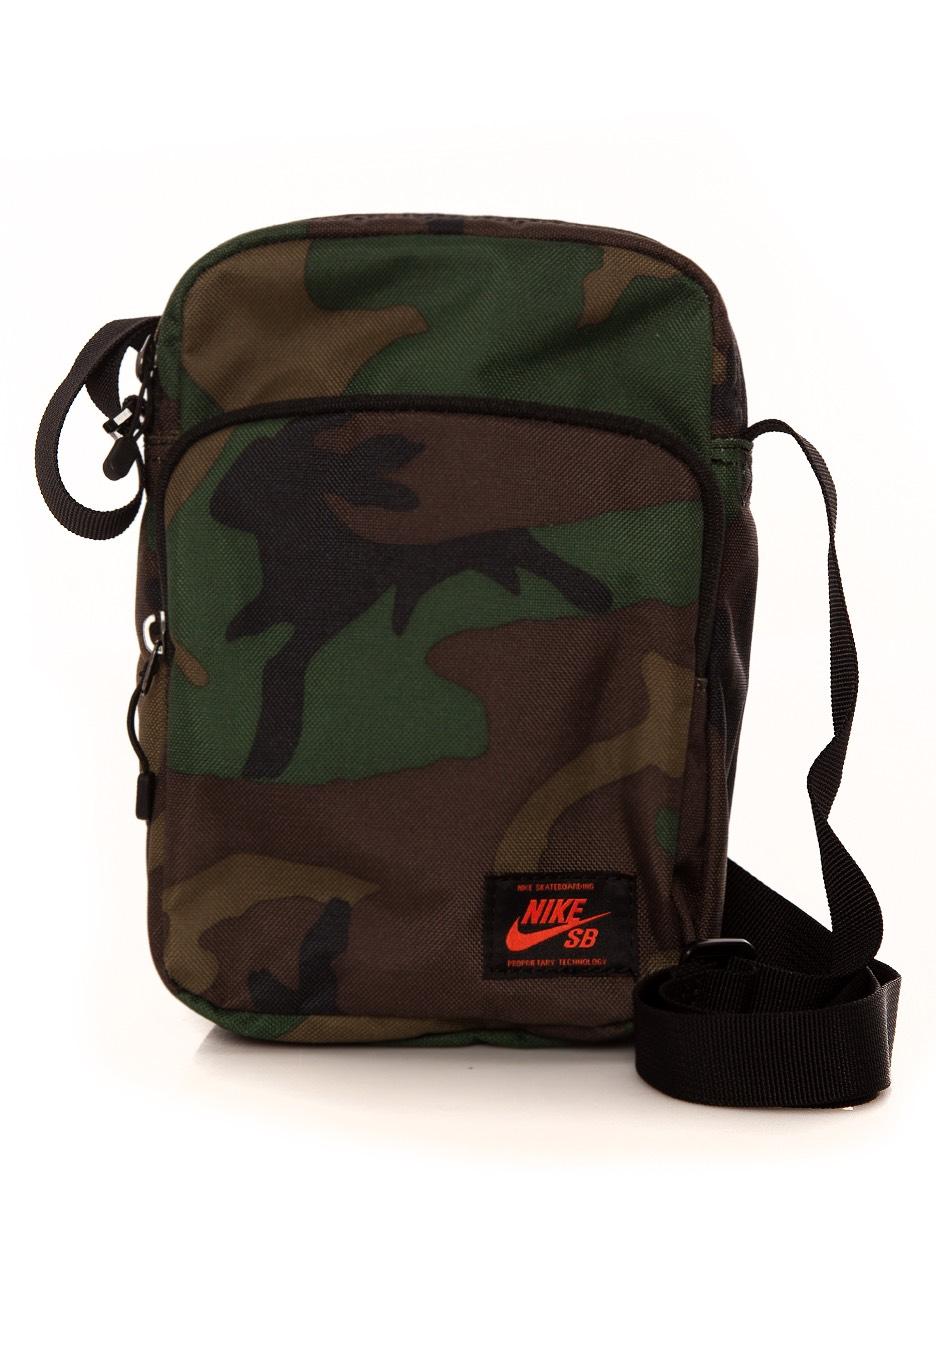 Nike Sb Heritage Iguana Black Team Orange Travel Bag